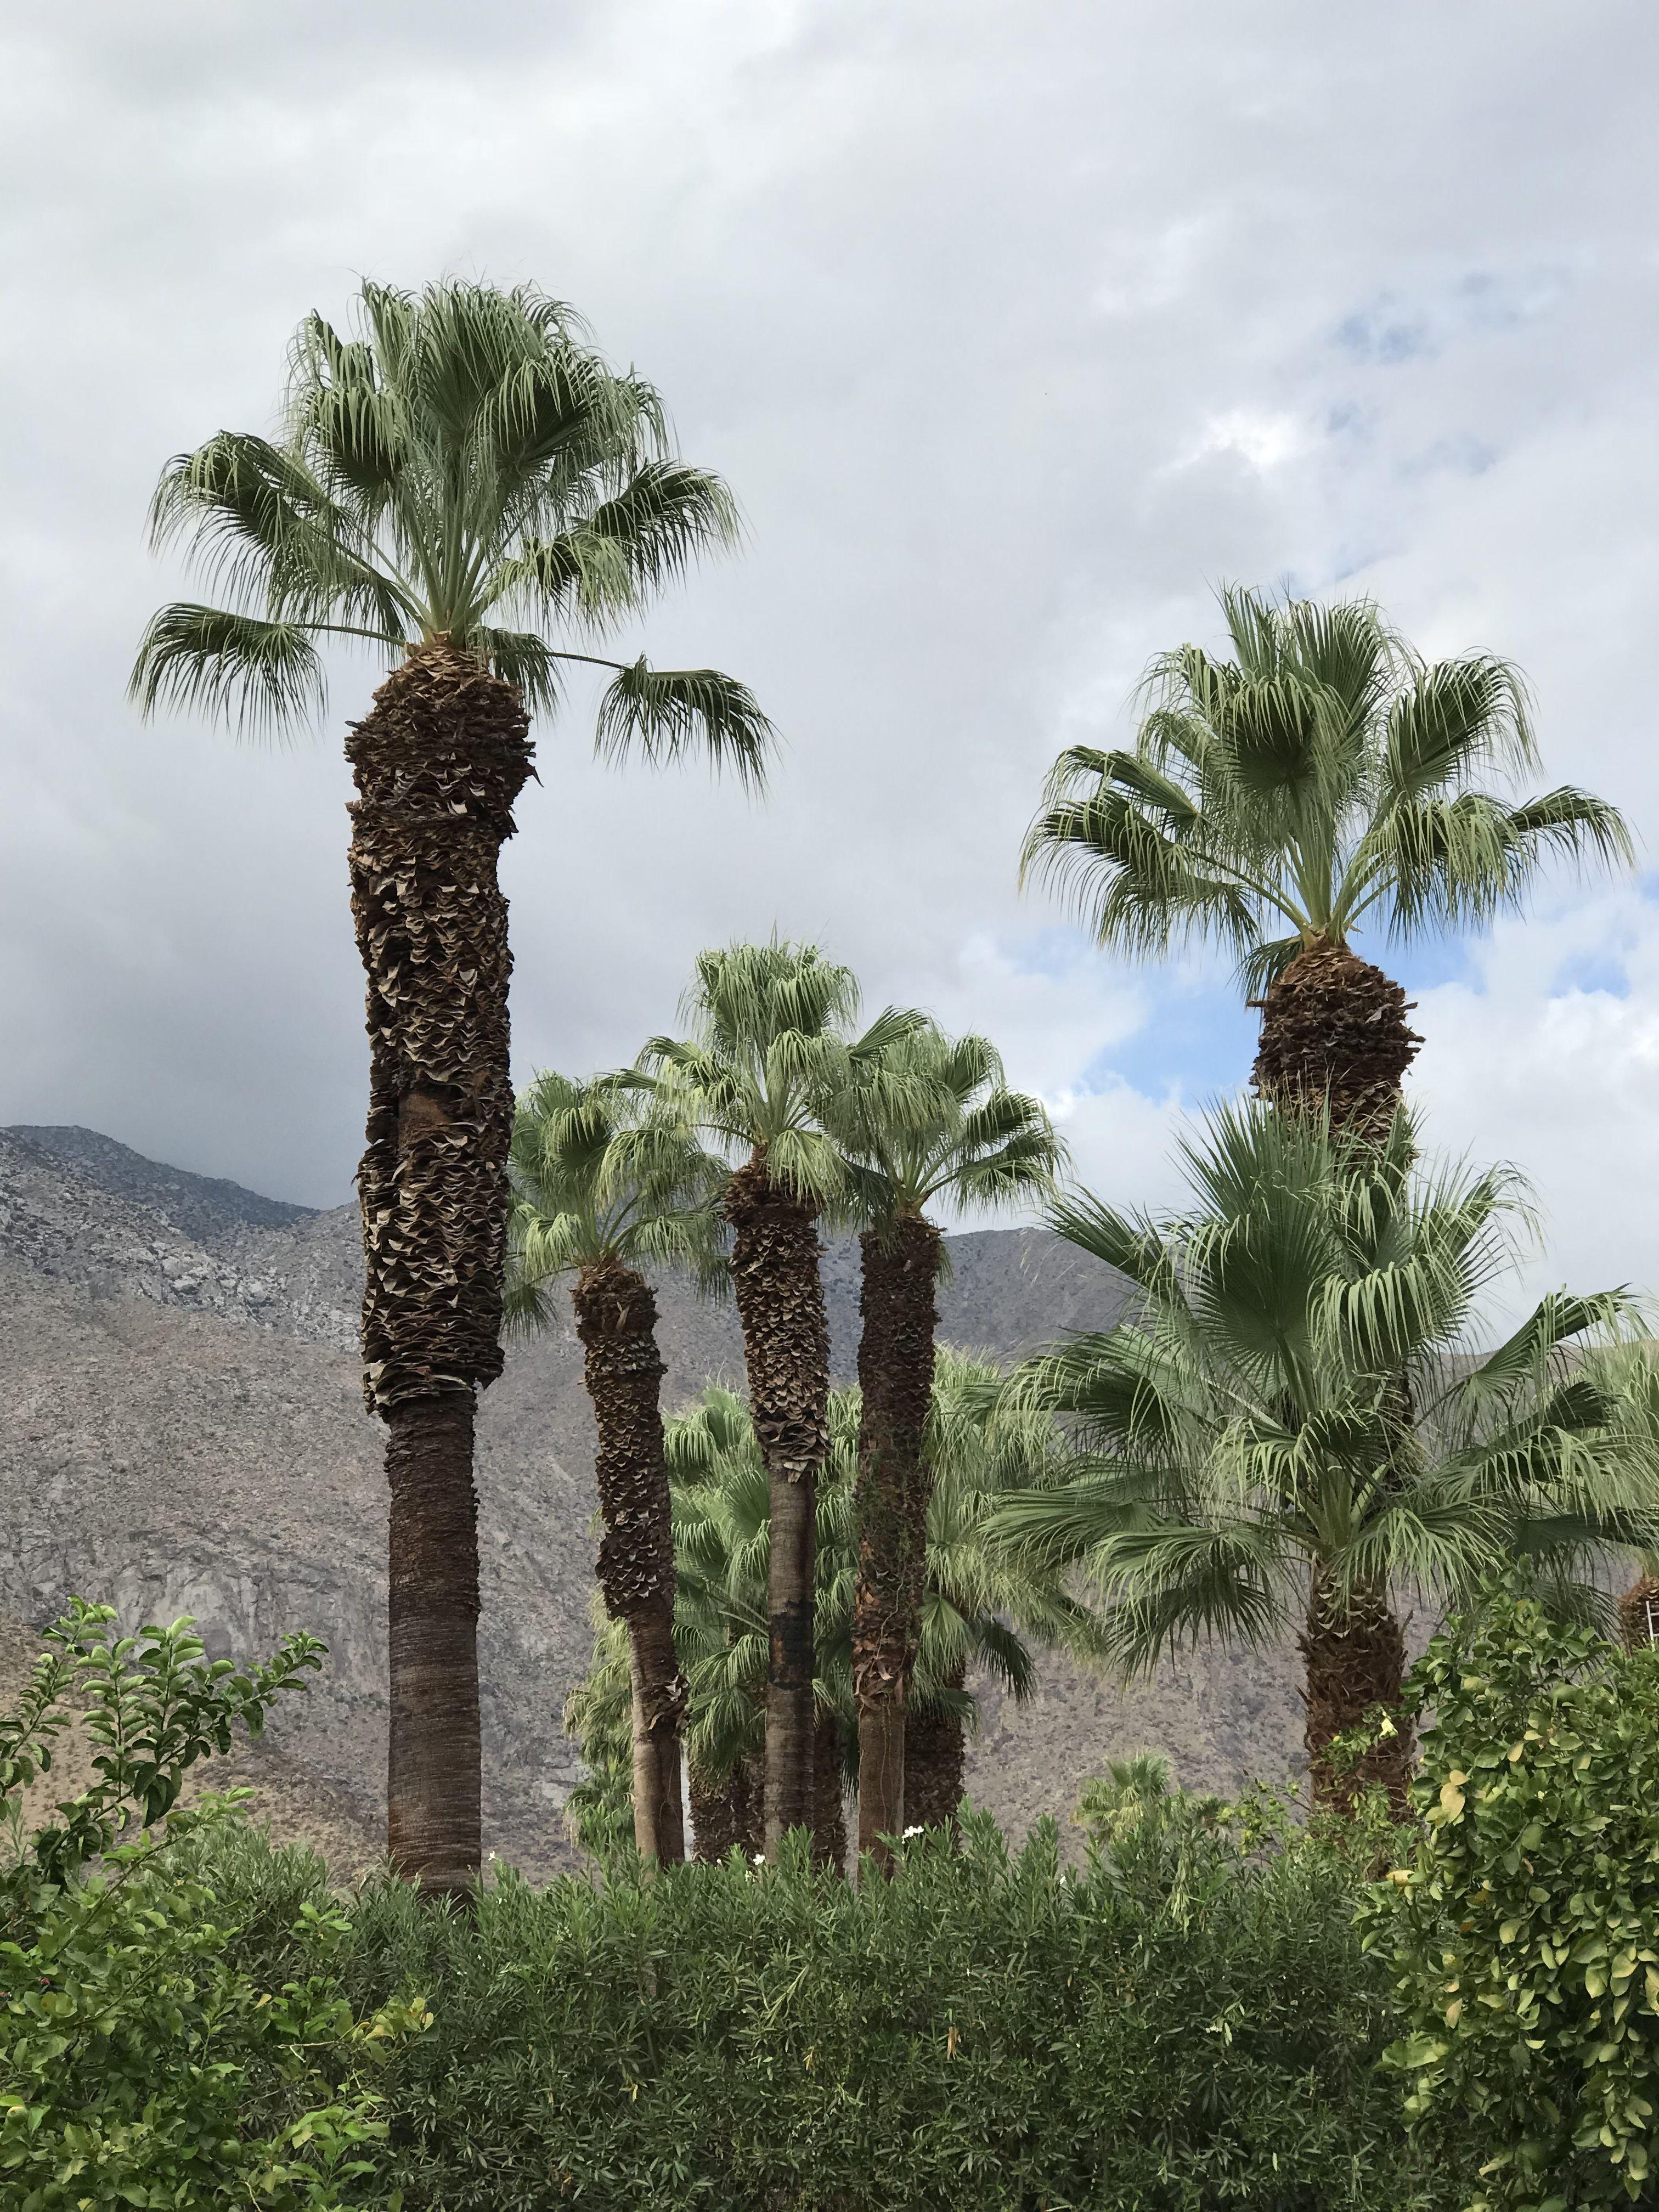 Cactus Palm Trees Stock Photo 76115560 - Shutterstock   Name Cactus Palm Tree